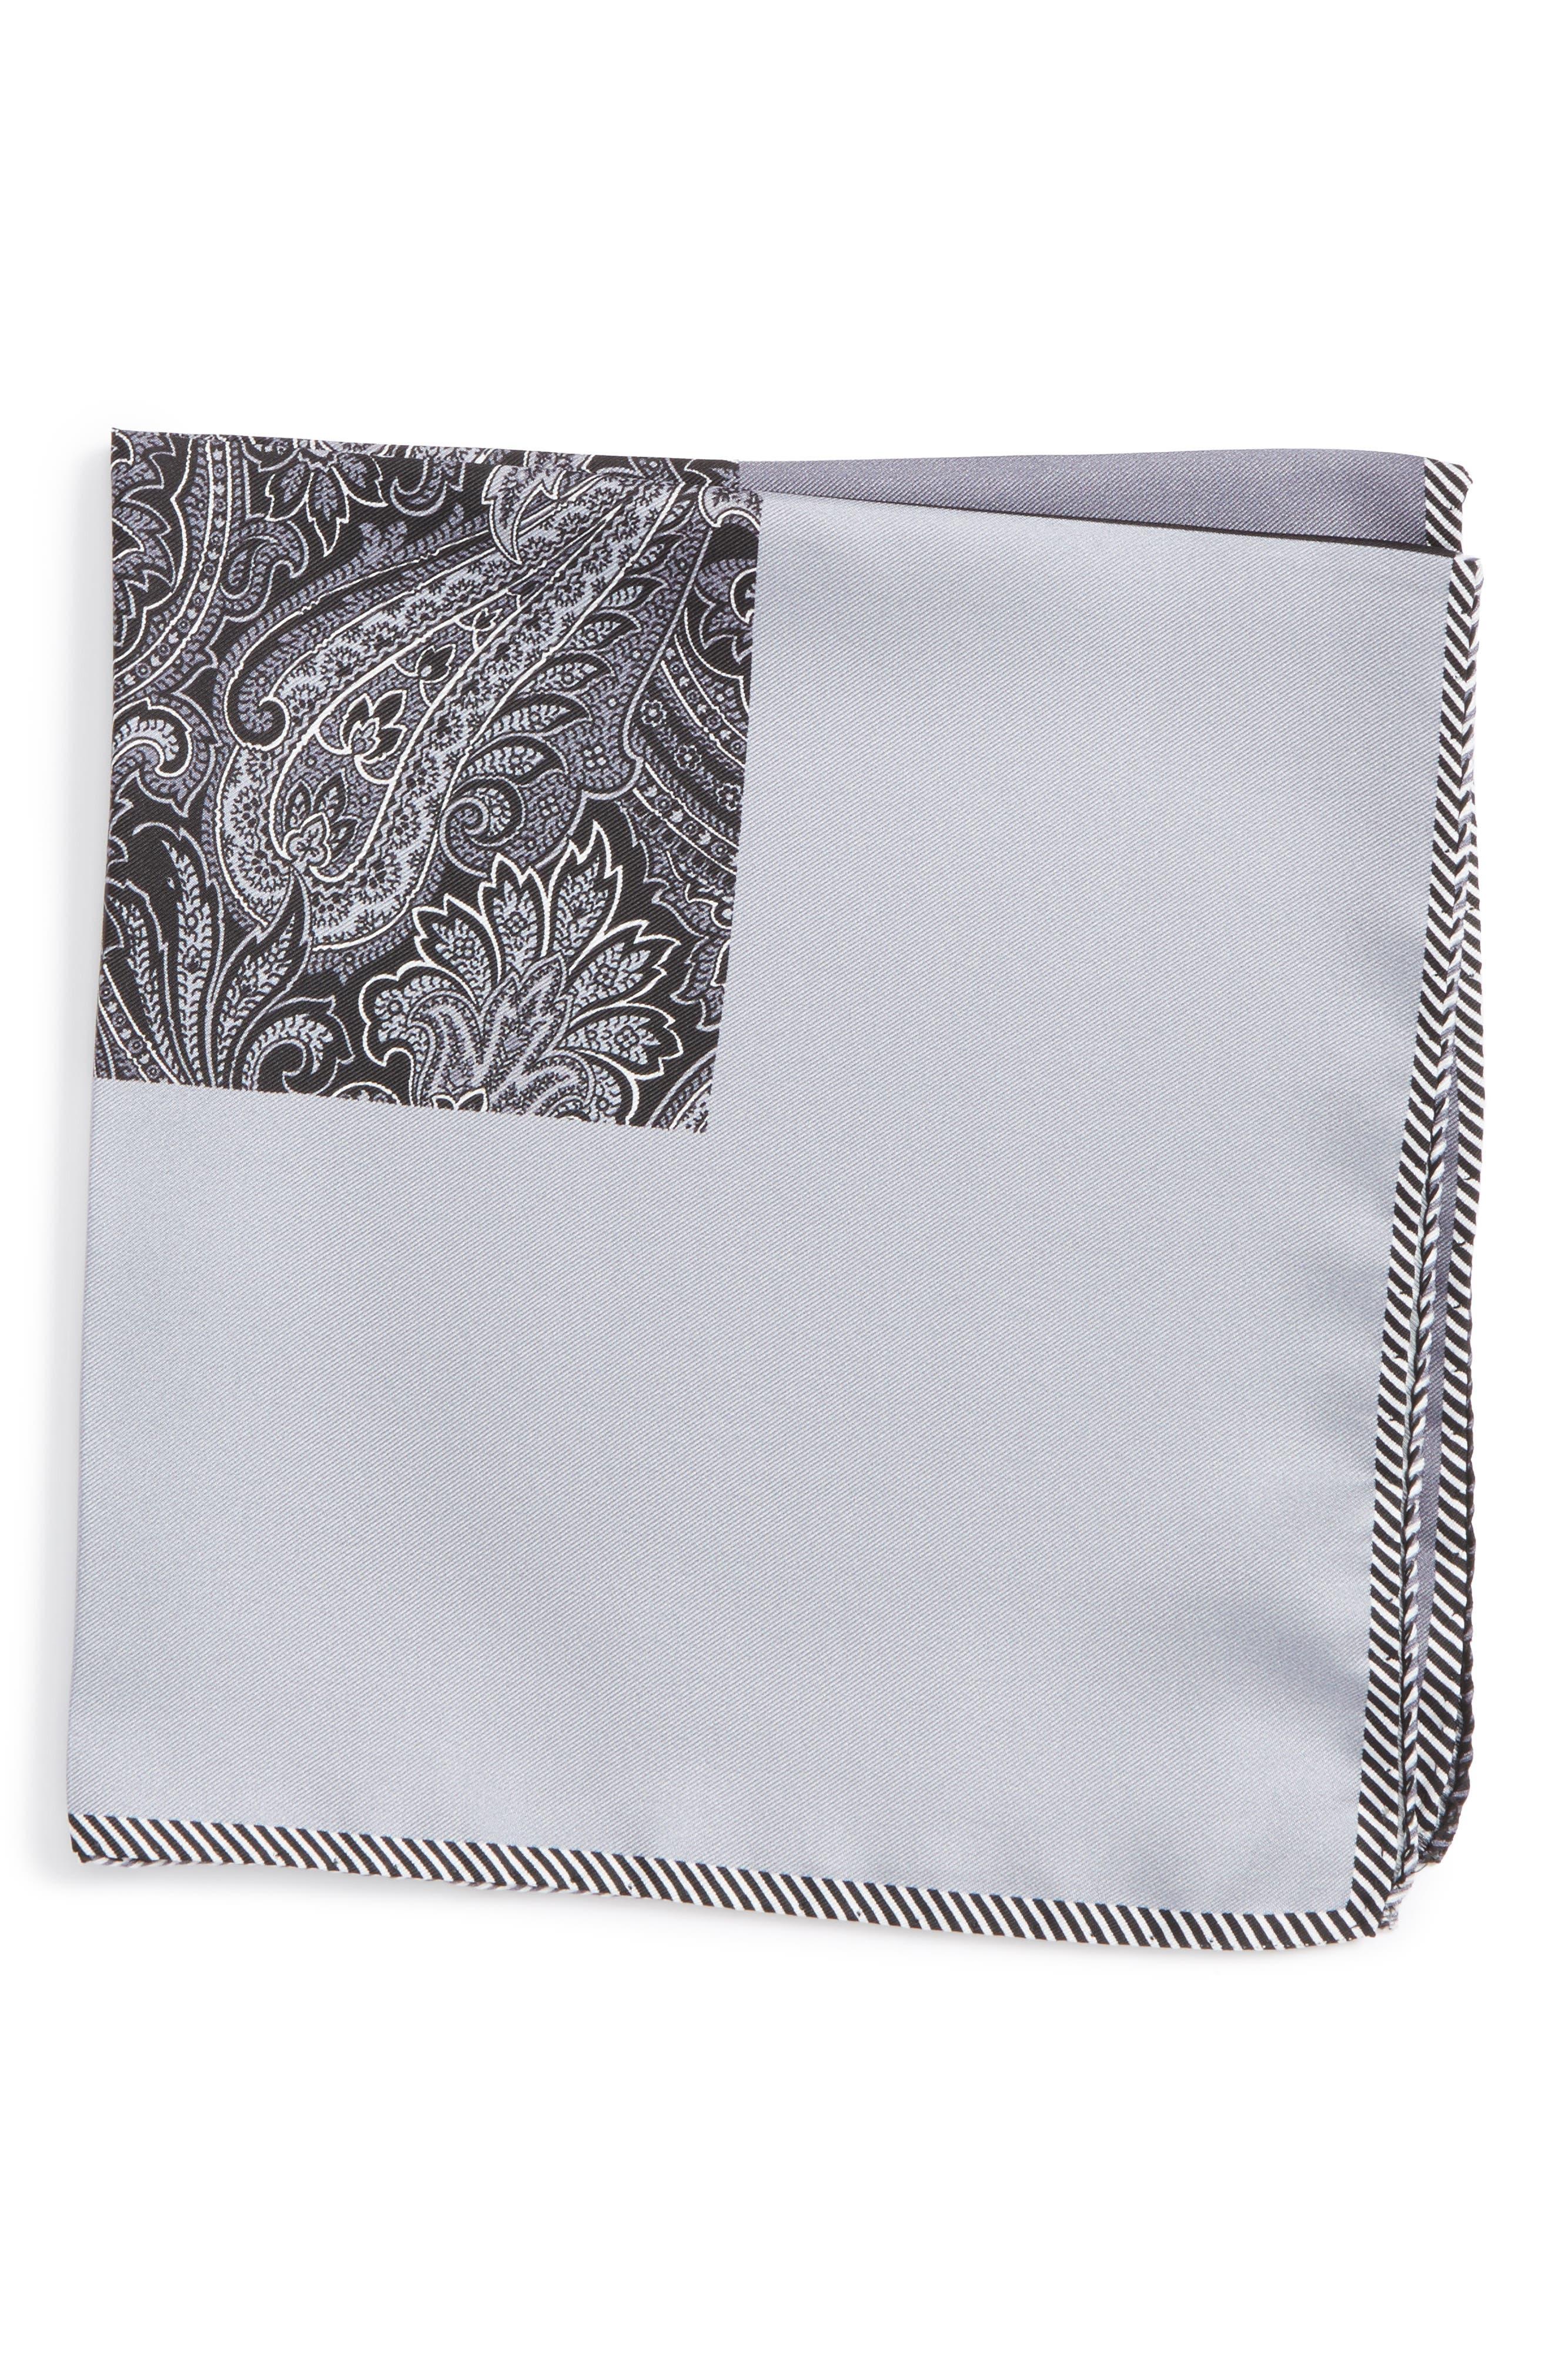 NORDSTROM MEN'S SHOP, Five Panel Silk Pocket Square, Main thumbnail 1, color, BLACK